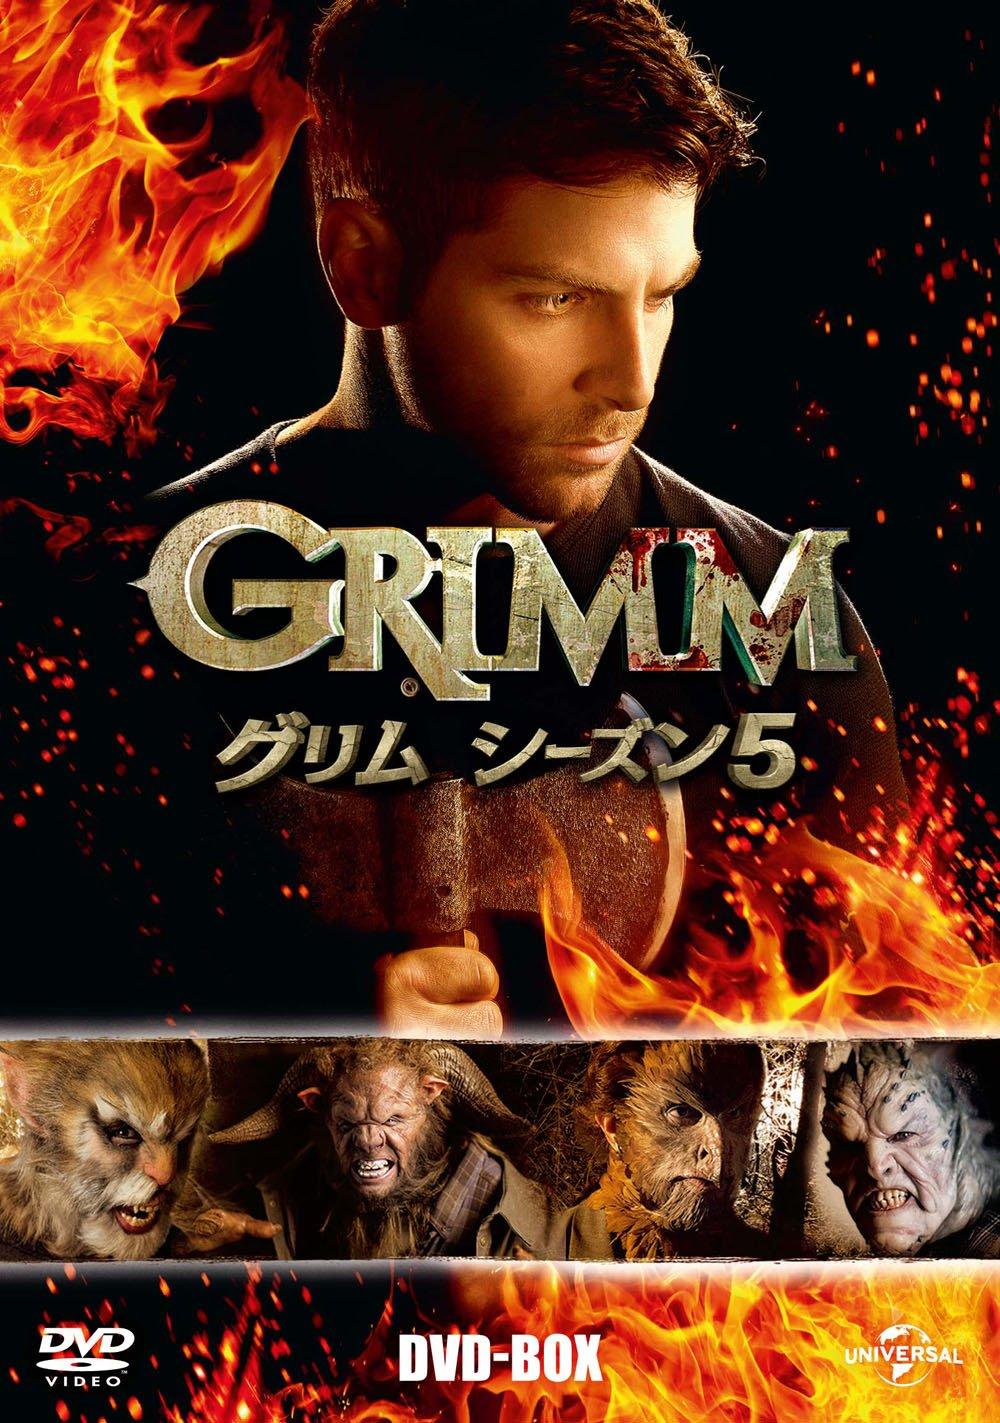 GRIMM/グリム シーズン5 DVD BOX B071GSQBYB